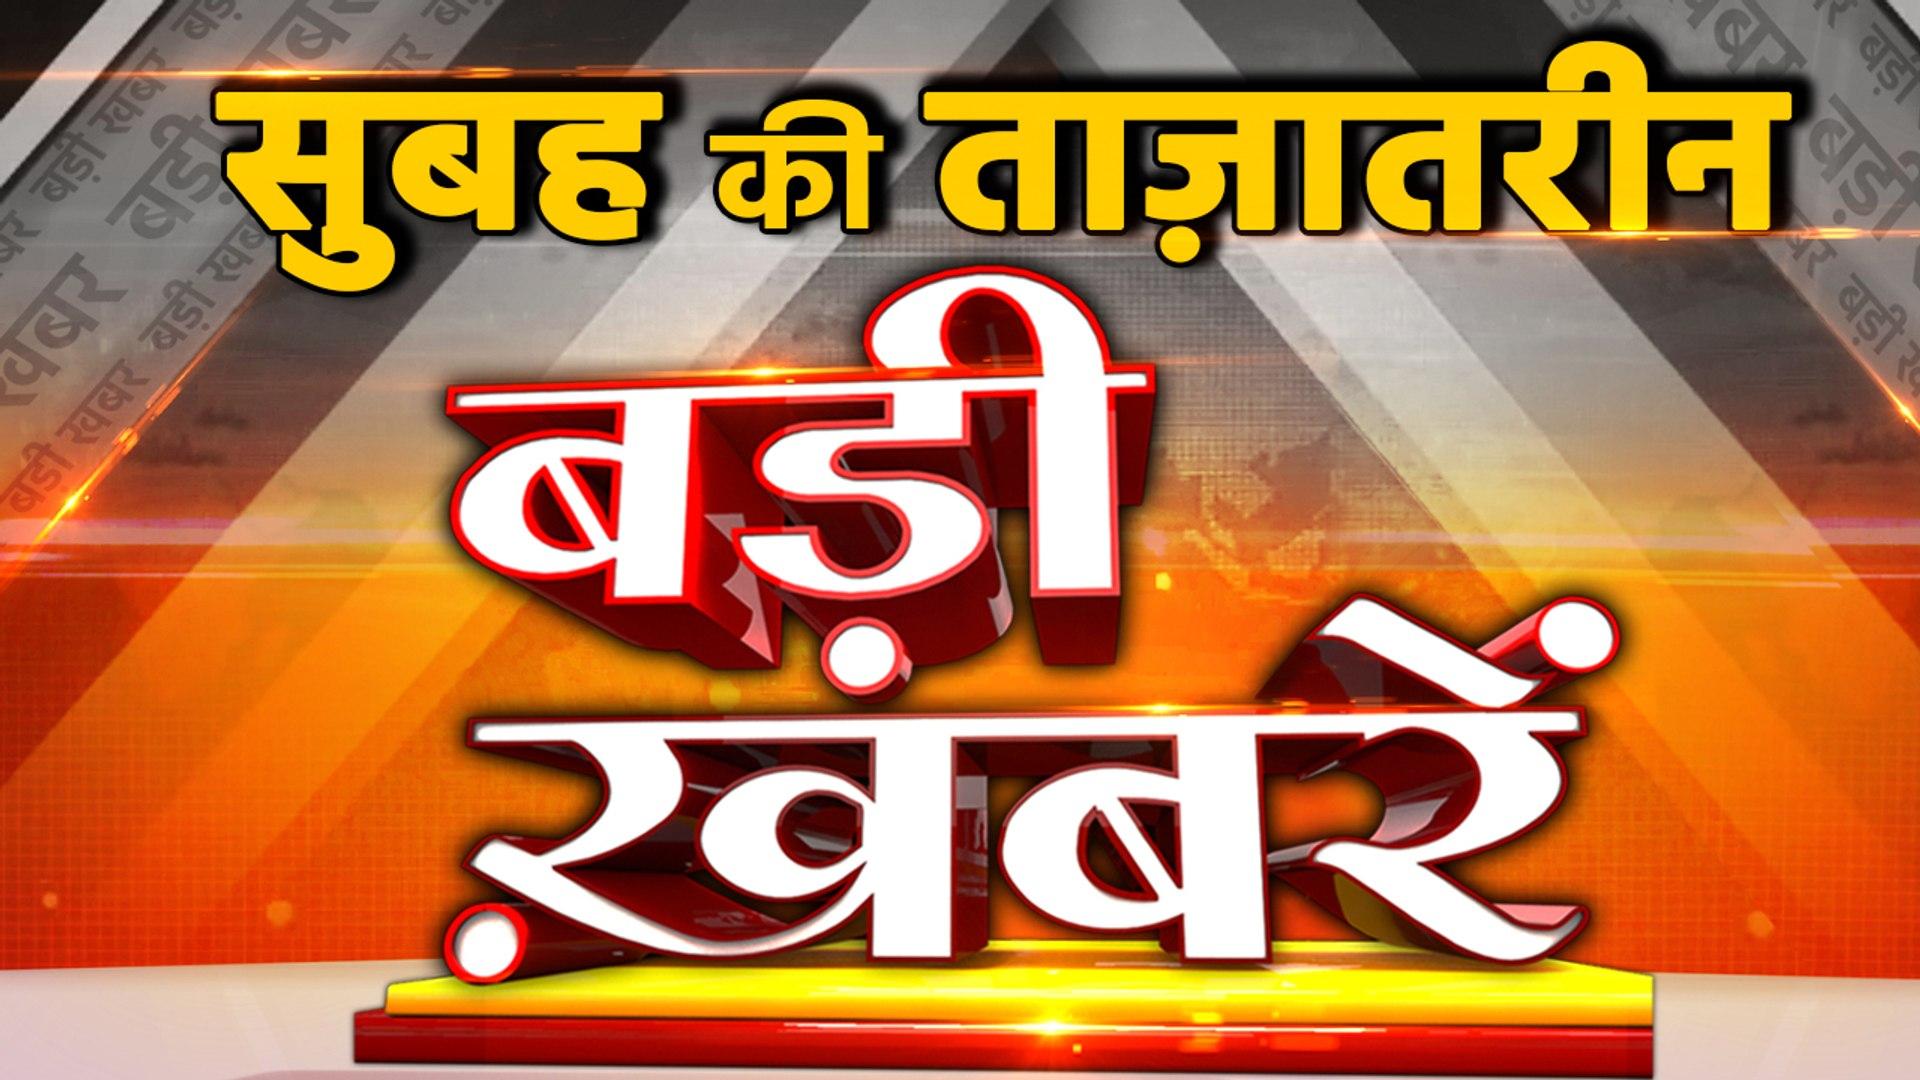 Top News | Latest News | Top Headlines | 28 November  News | India Top News | वनइंडिया हिंदी